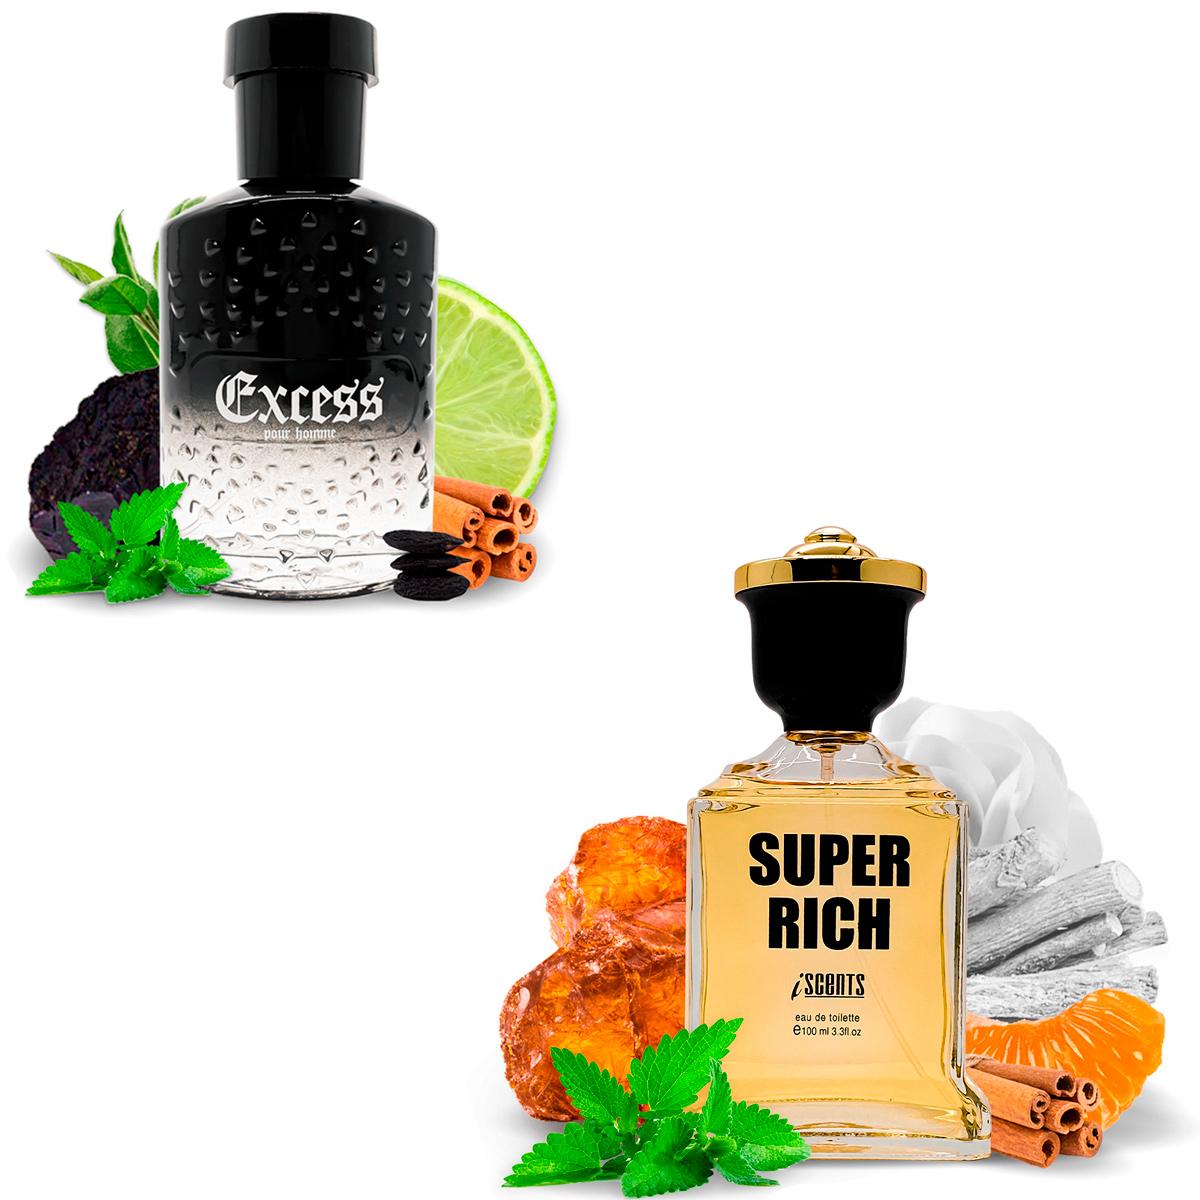 Kit 2 Perfumes Importados Excess e Super Rich I Scents